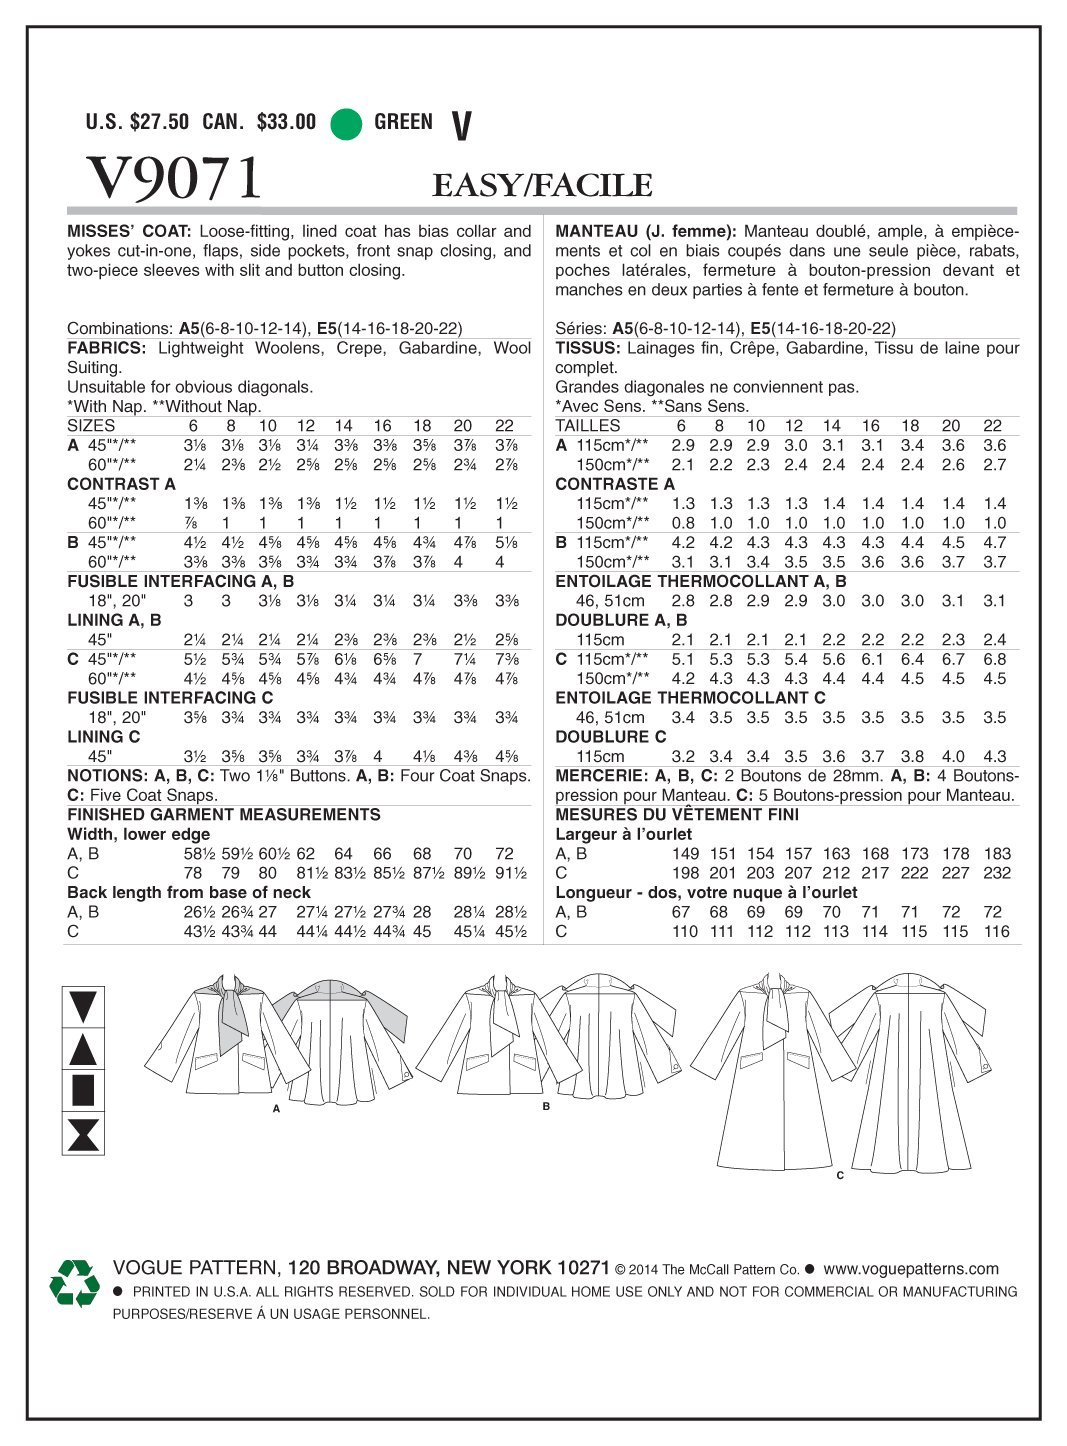 Vogue V9071 costura para confeccionar blusas, trajes, vestidos, moda, VGE 9071 E5 (14-22) 40-48: Amazon.es: Hogar